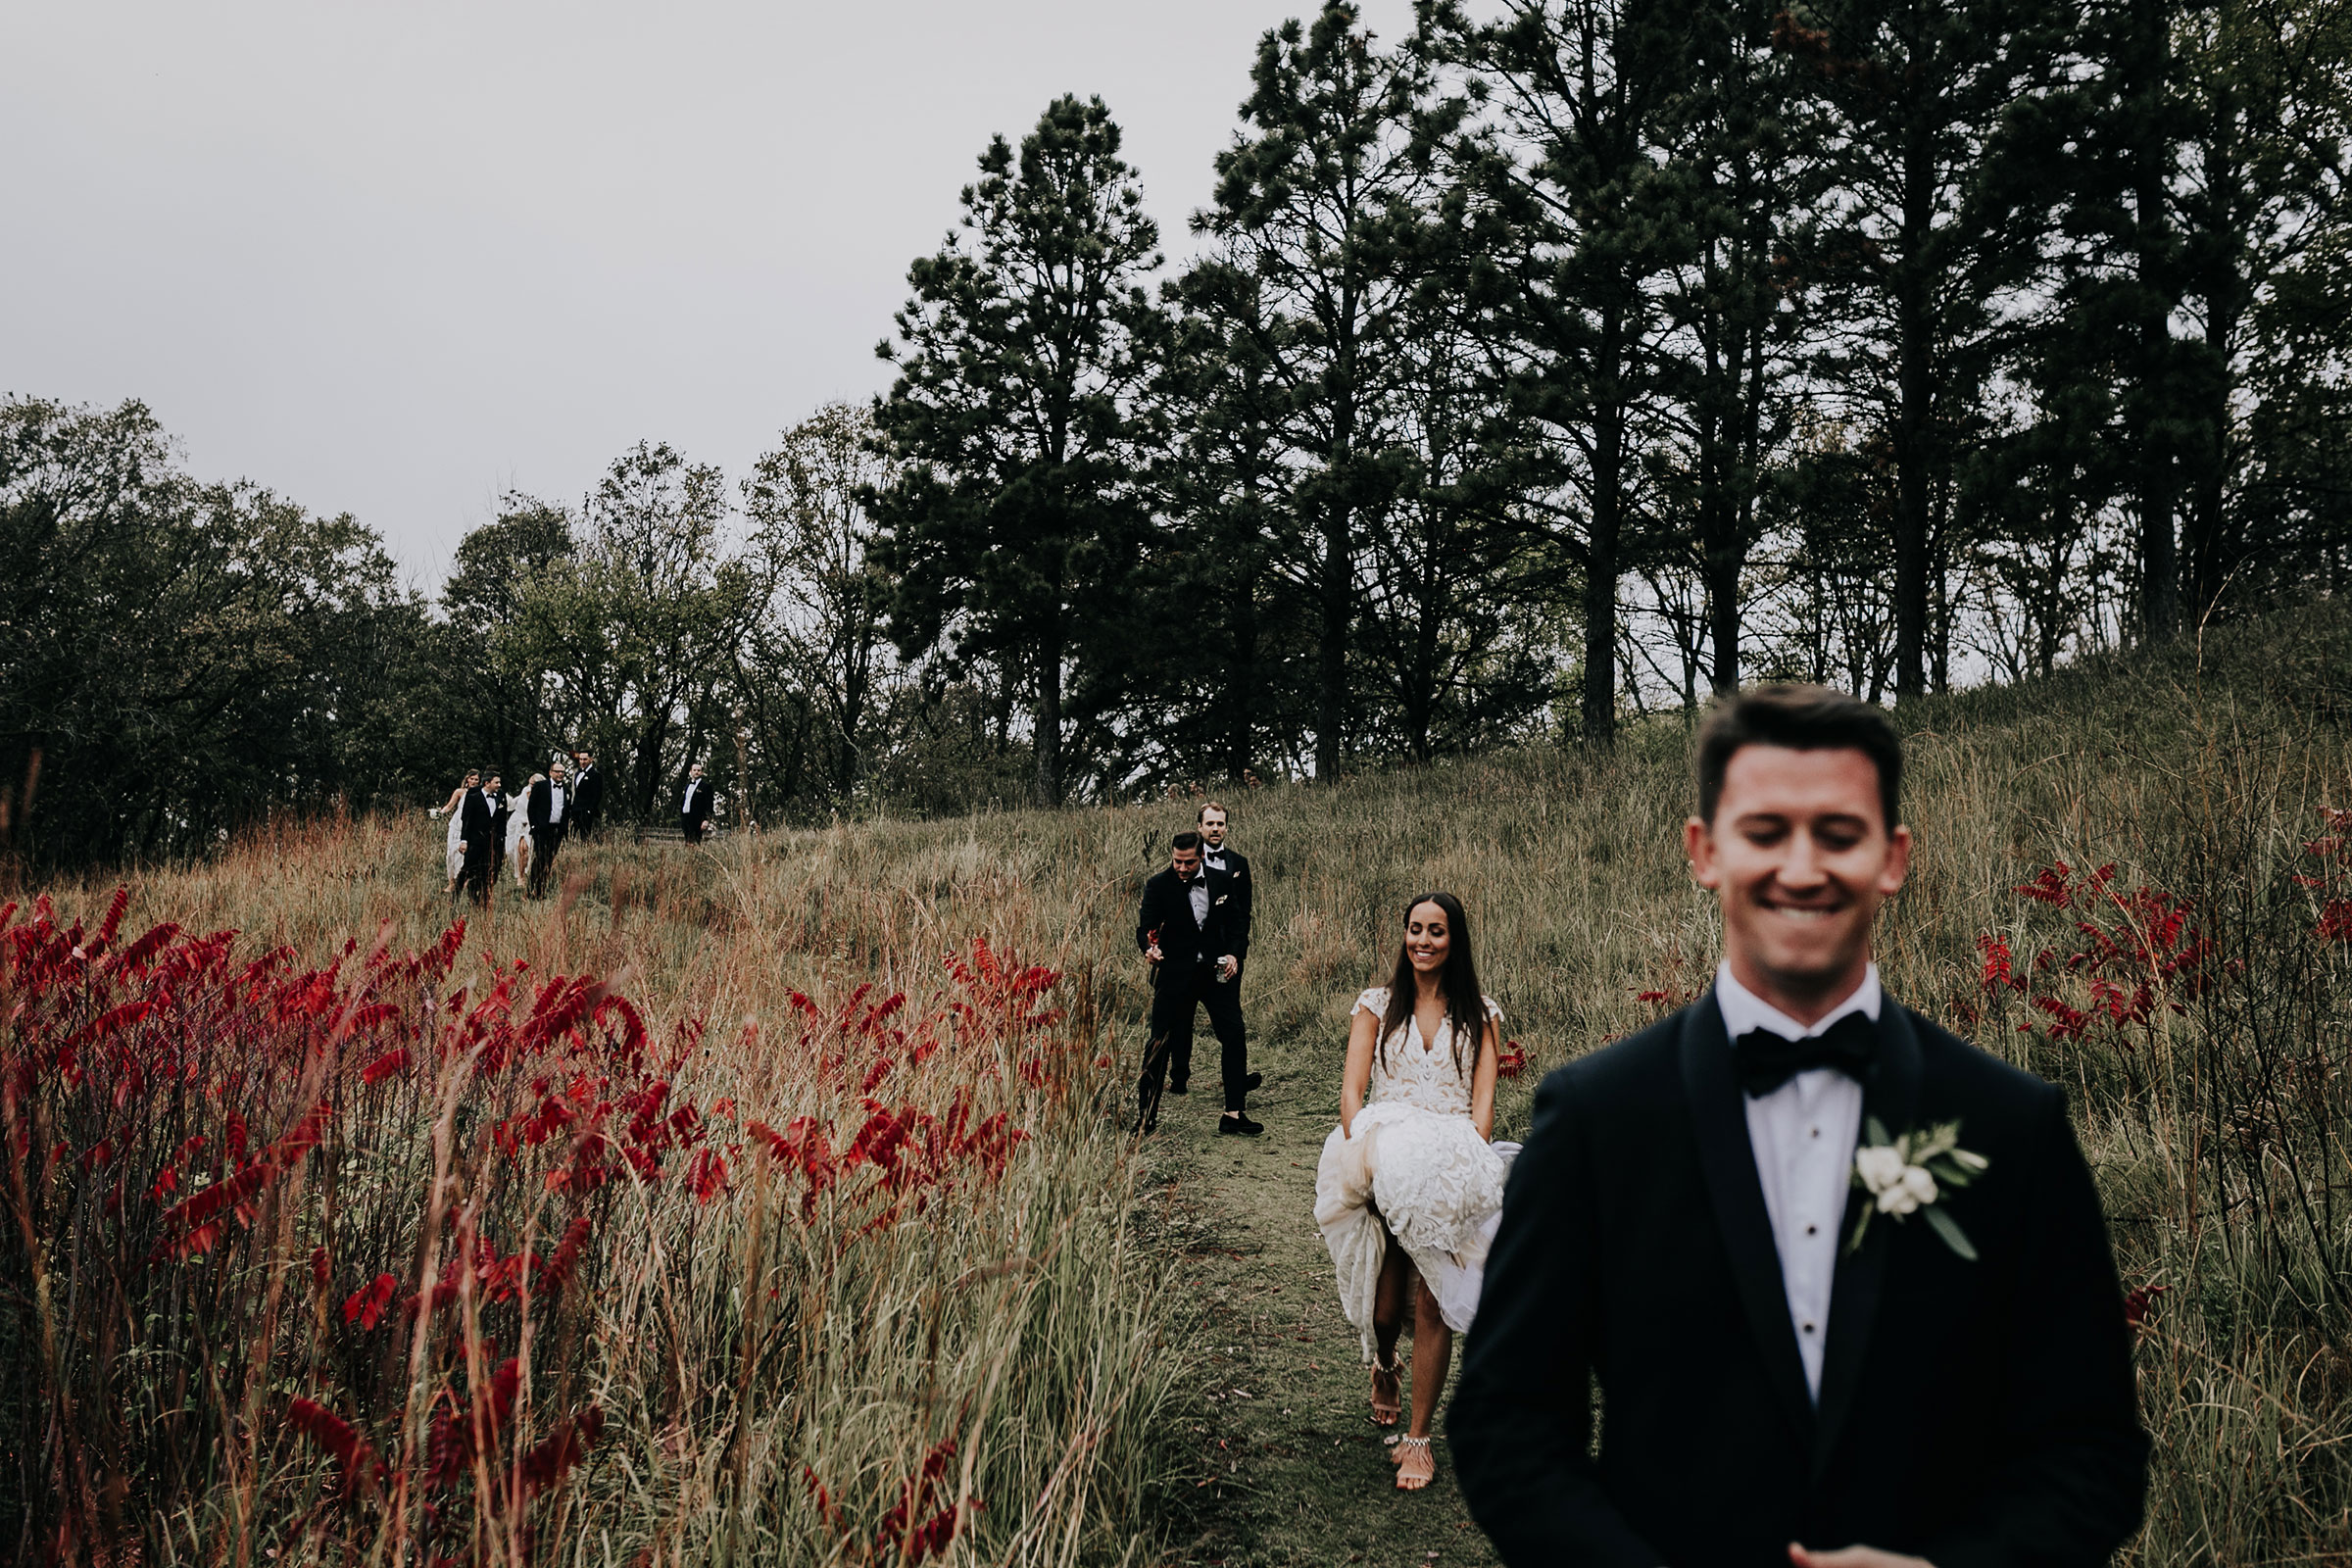 wedding-party-walking-down-hill-omaha-nebraska-raelyn-ramey-photography.jpg